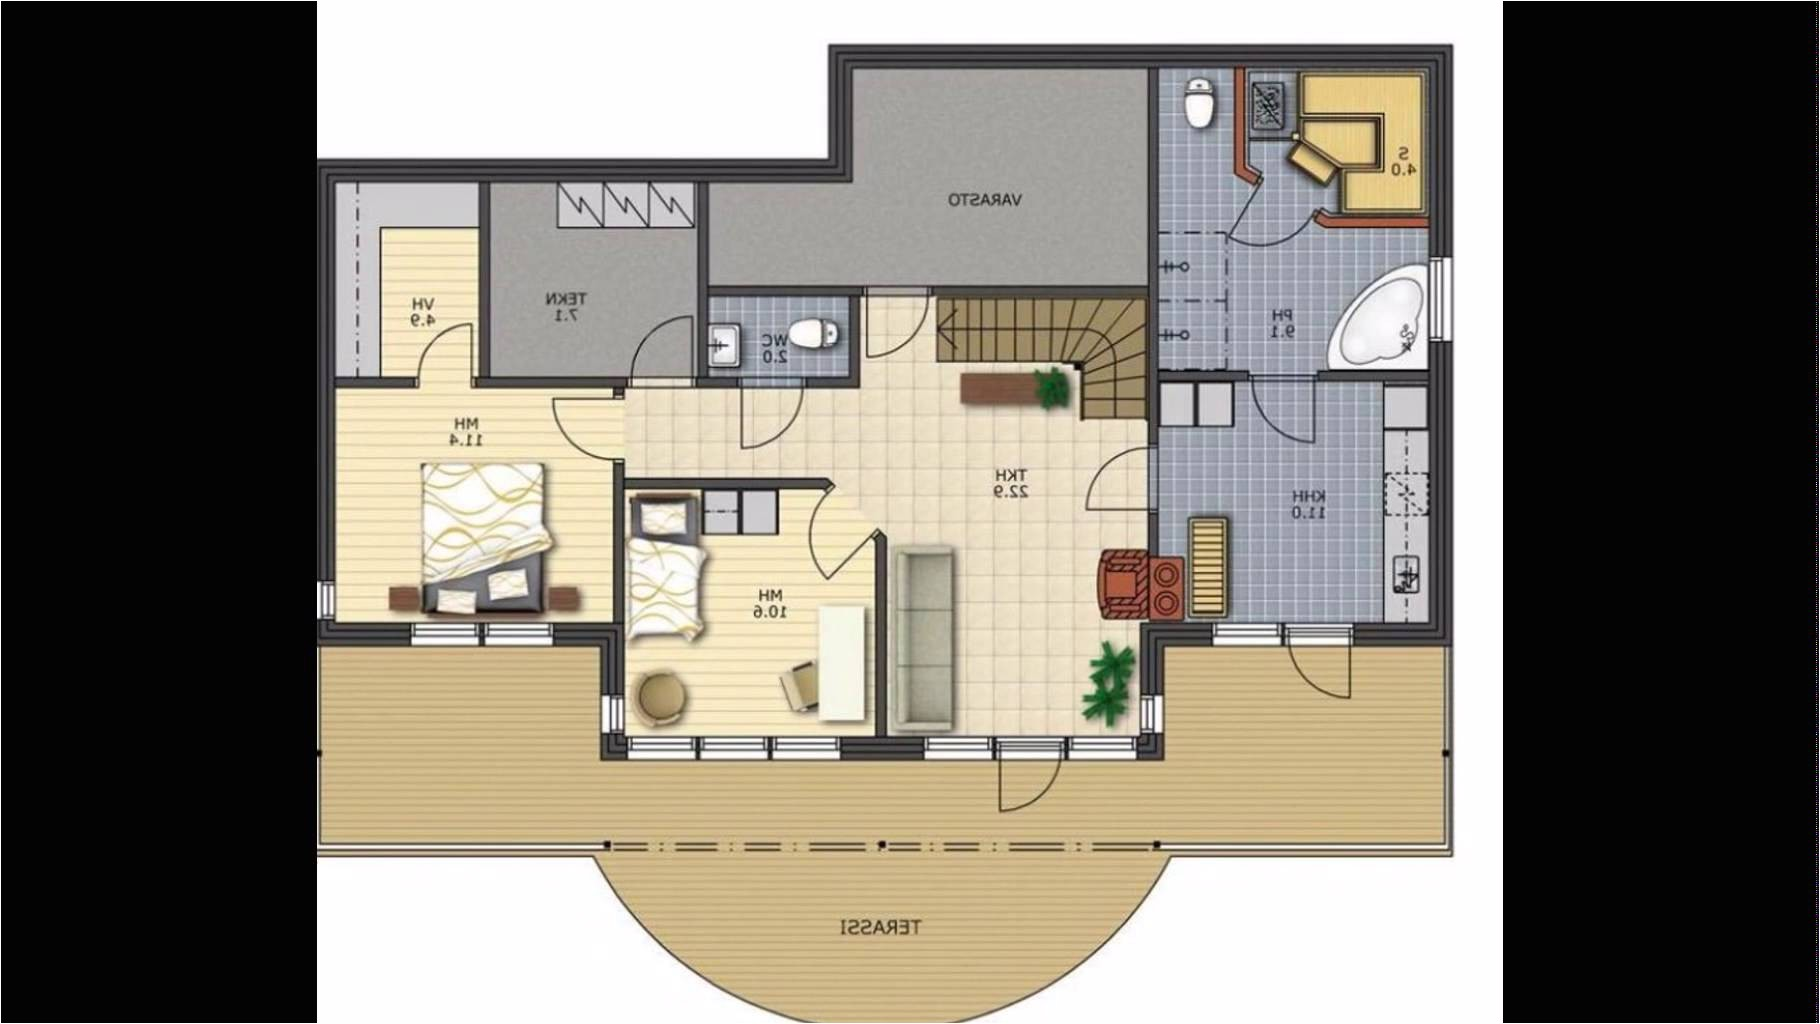 3 bedroom modern house plans jessica nilsson